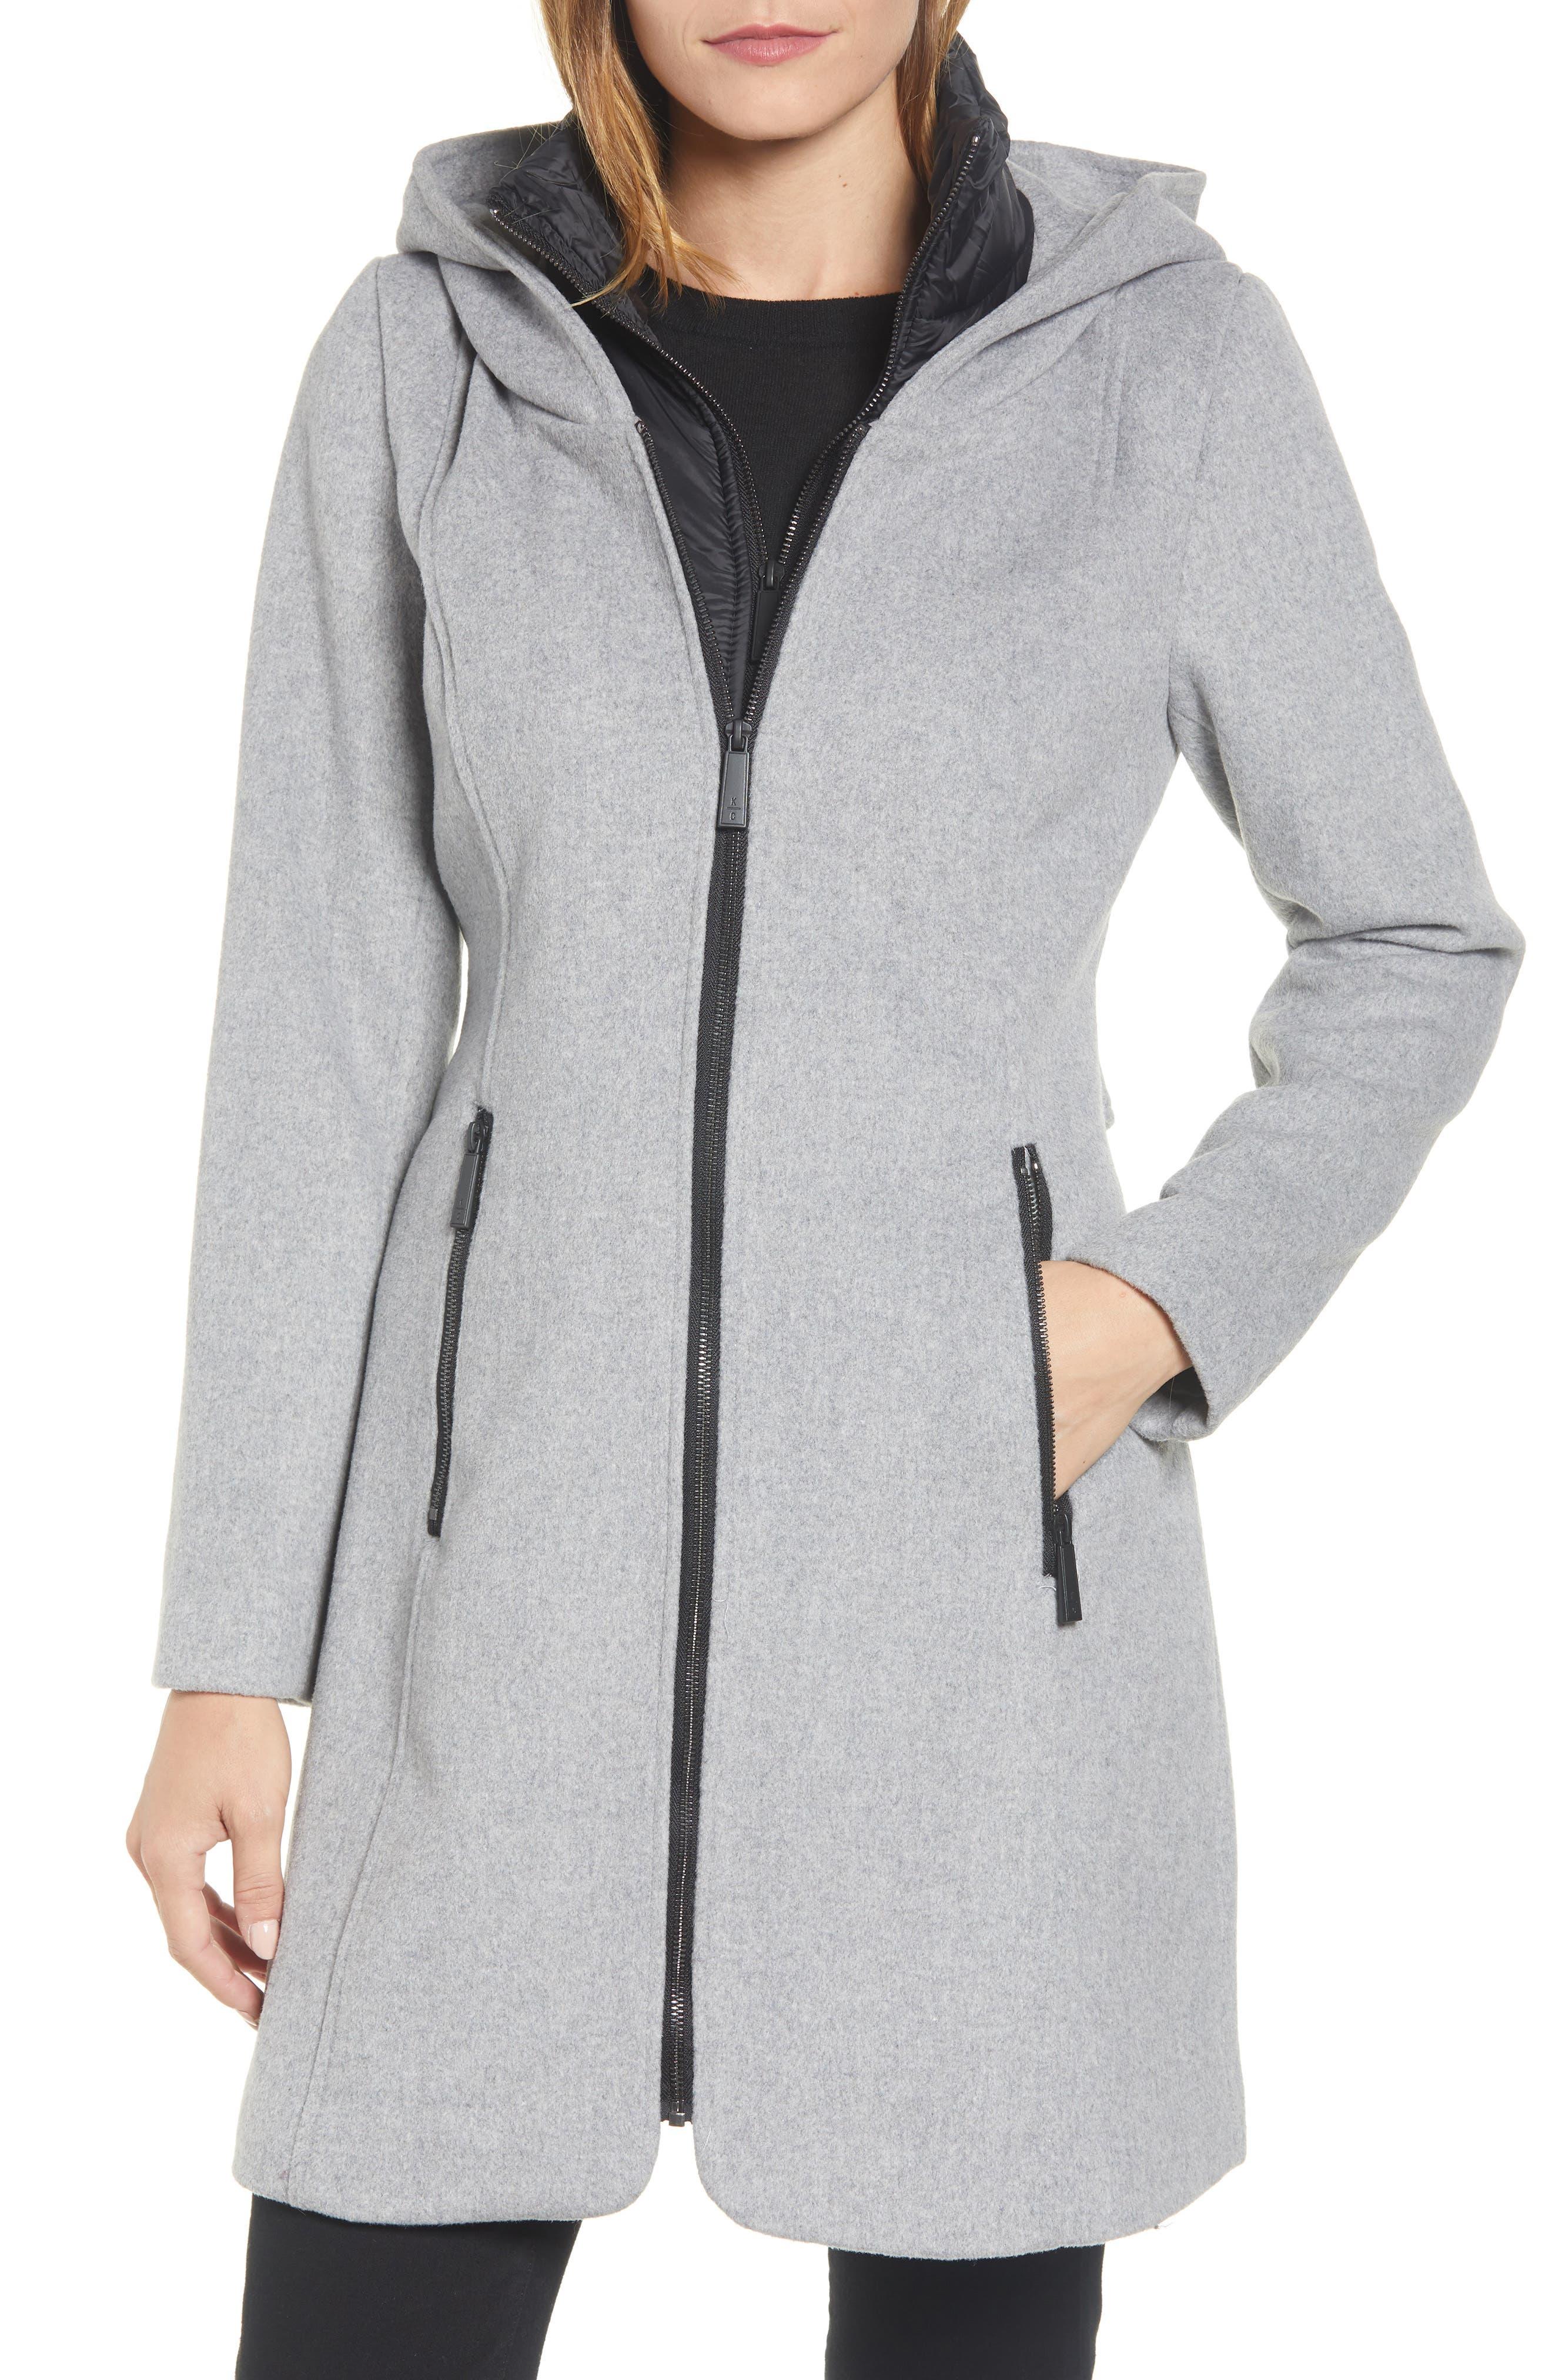 Hooded Twill Coat,                             Main thumbnail 1, color,                             033